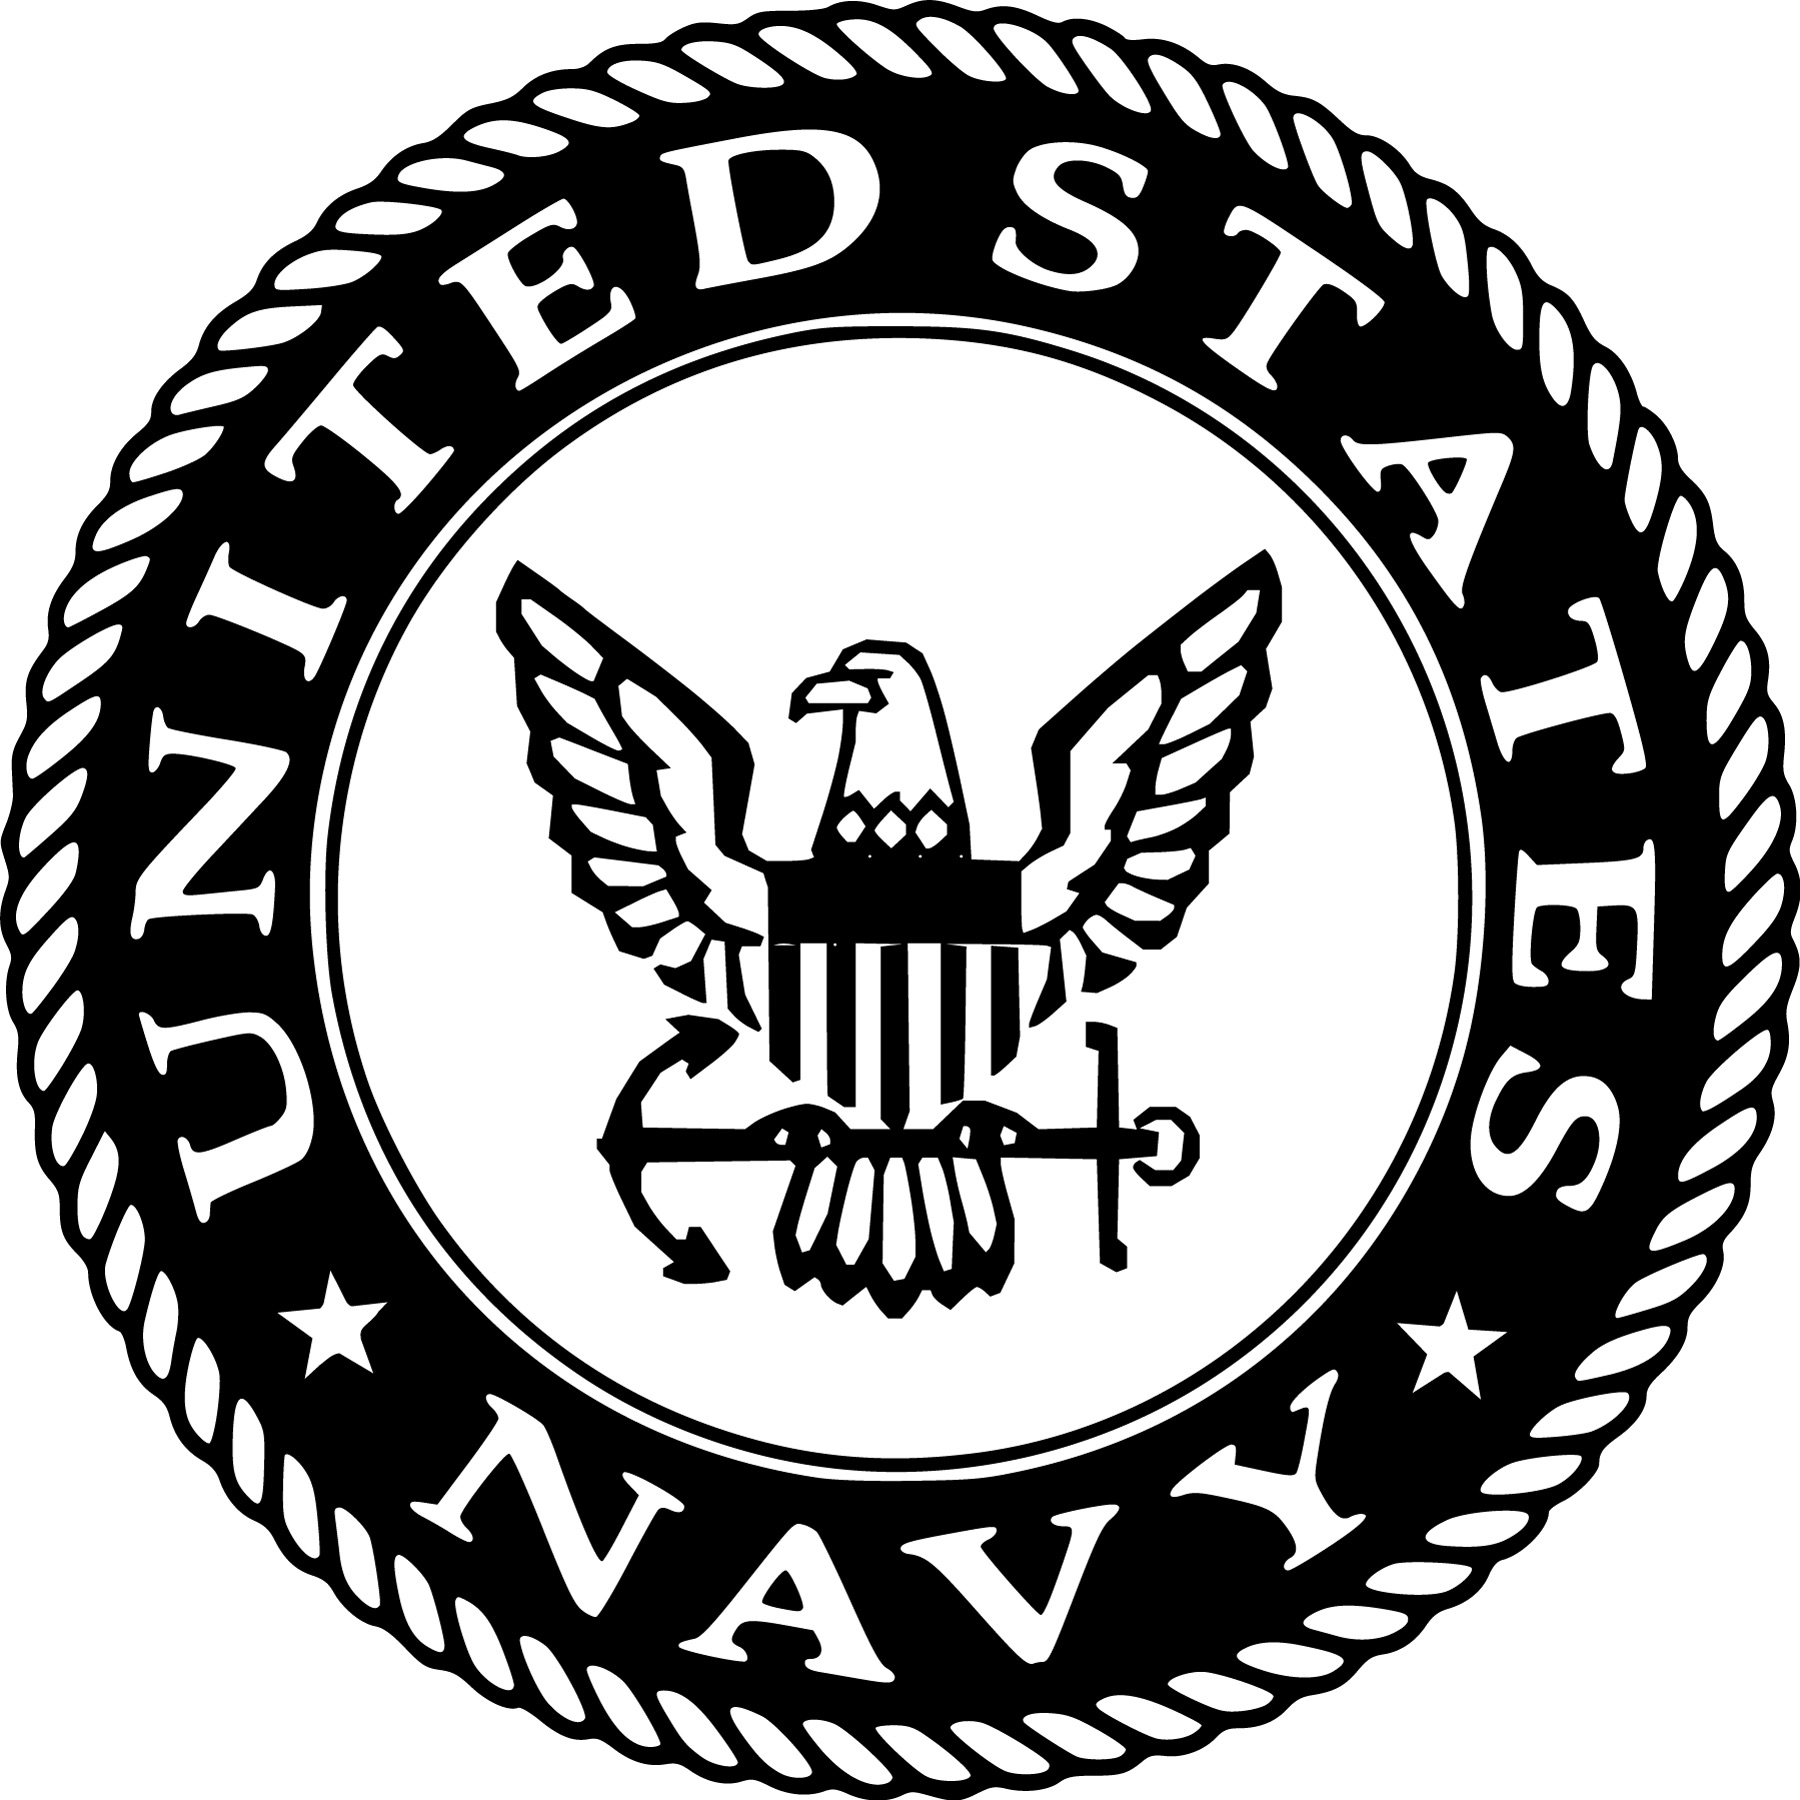 navy.jpg?time=1610996778